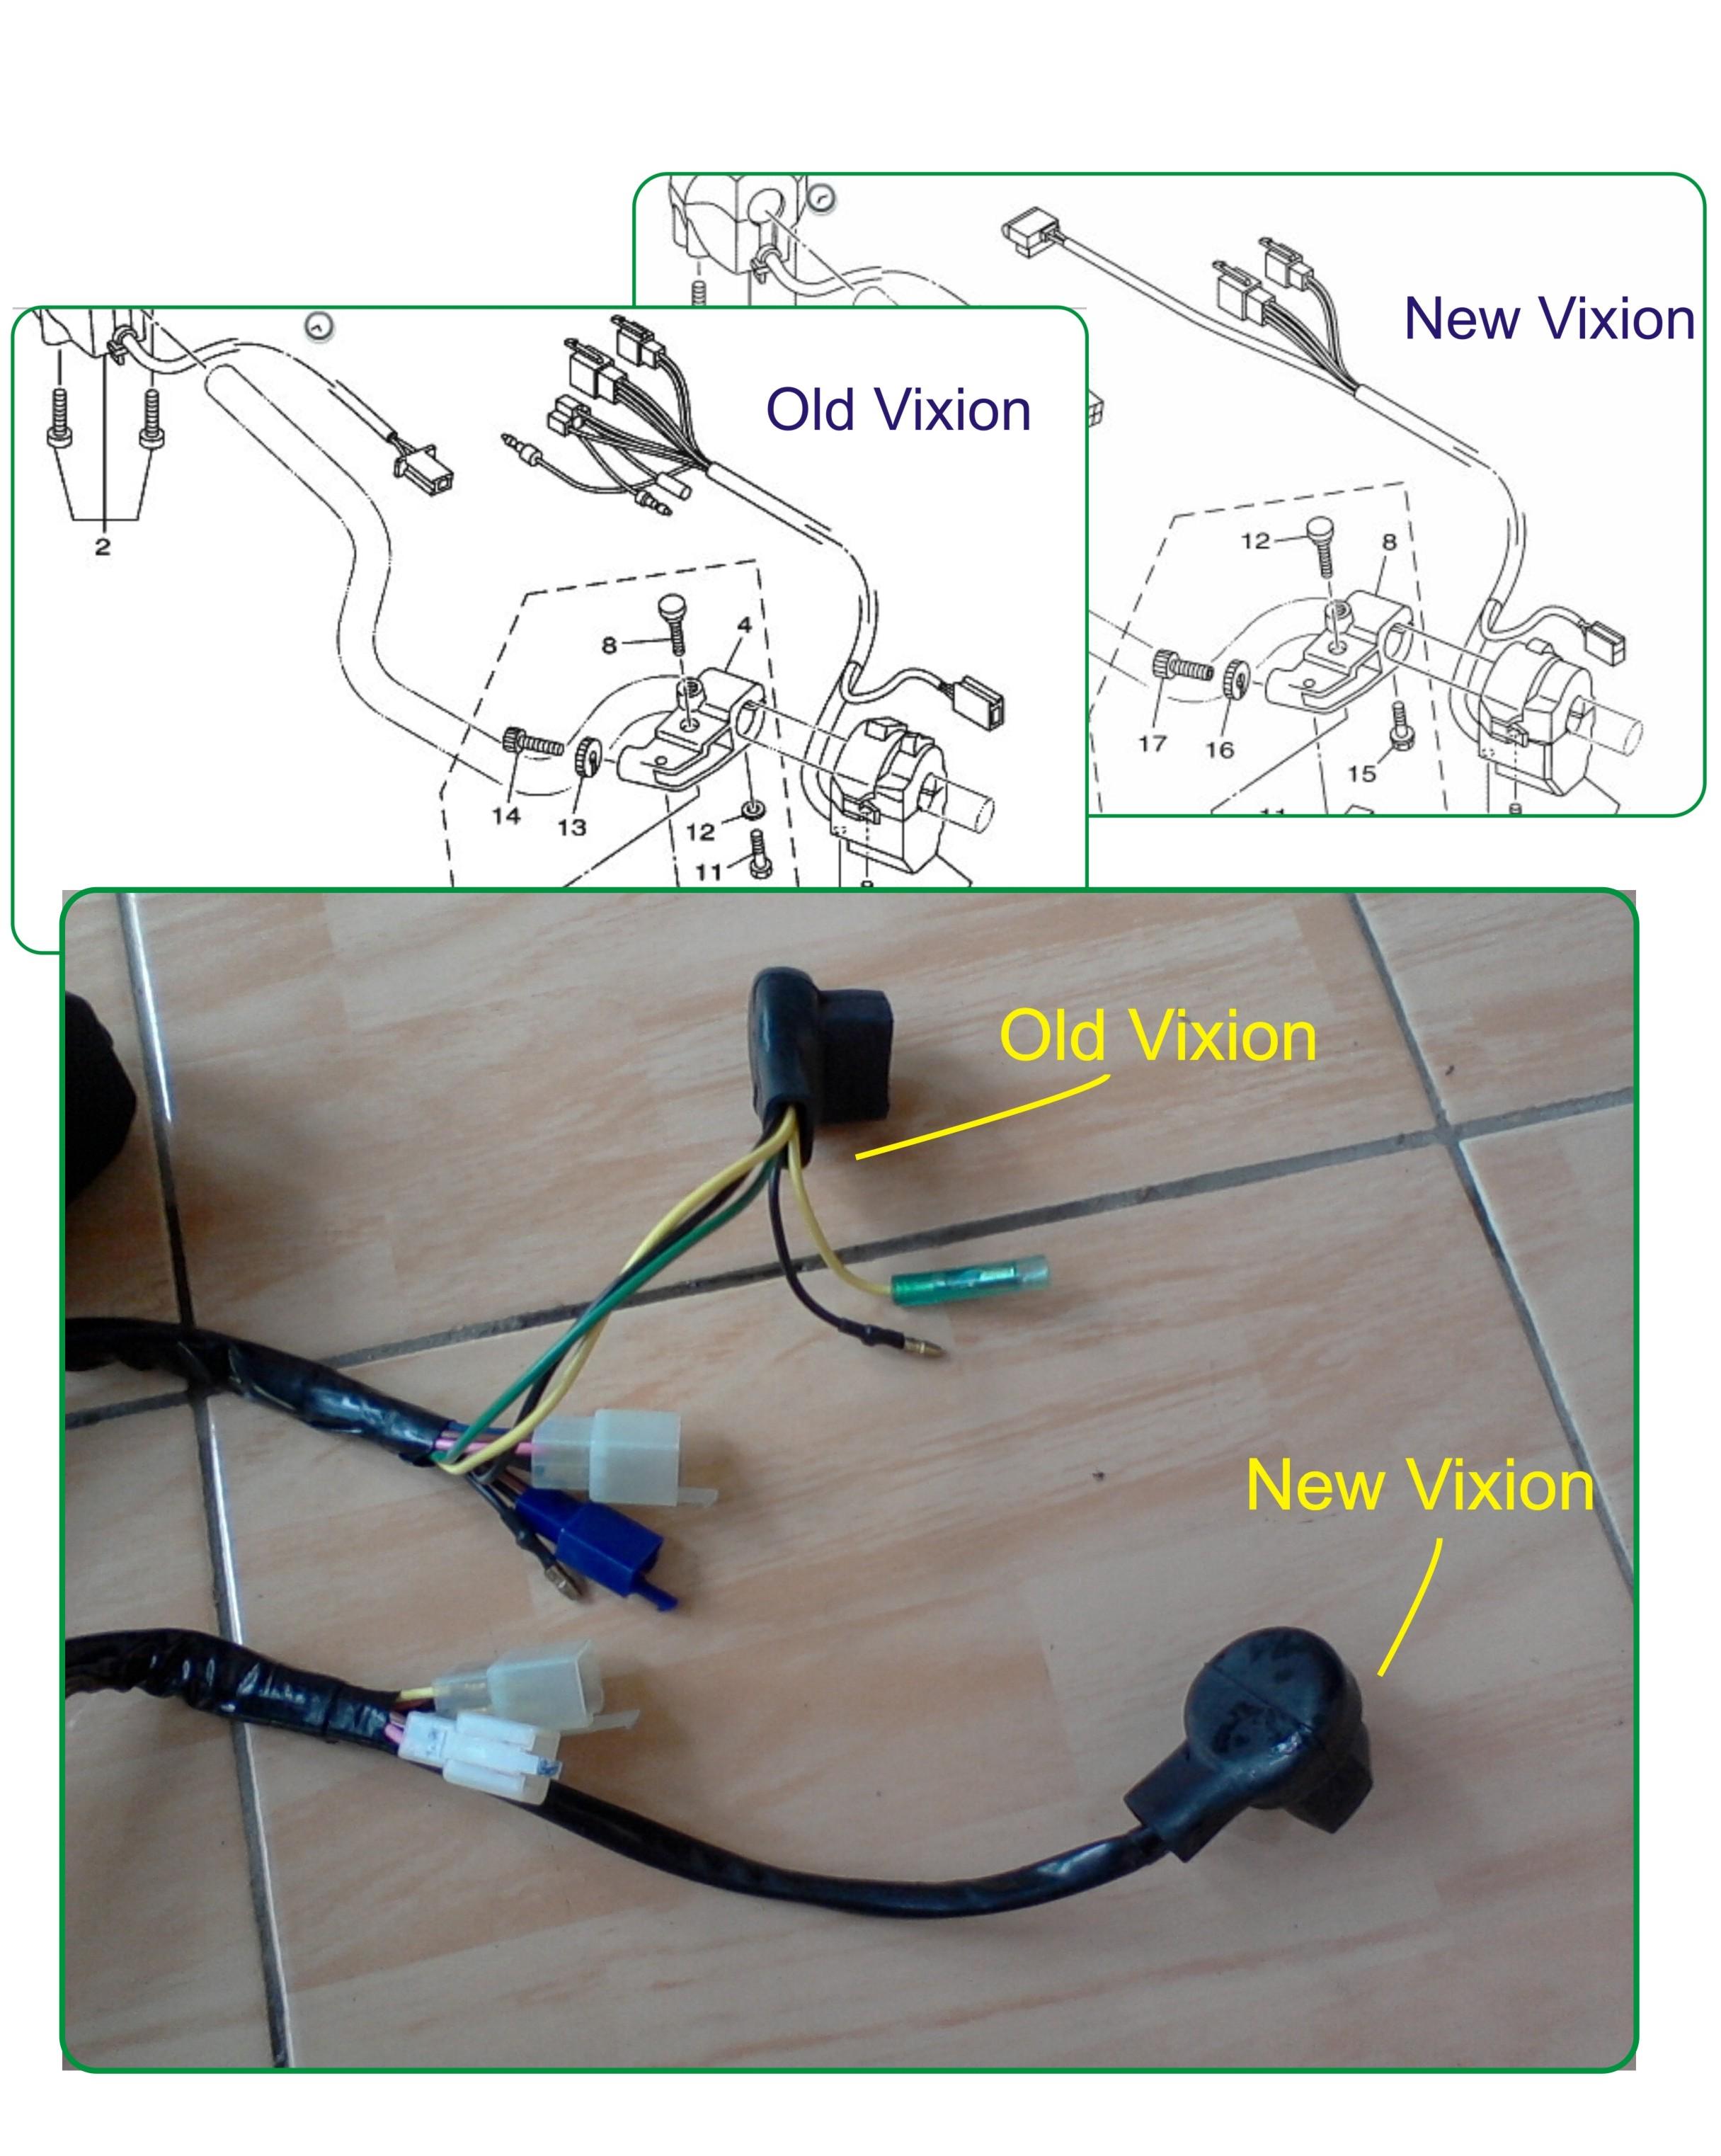 Cara pasang saklar old vixion pada new vixion thawils blog switch asfbconference2016 Gallery